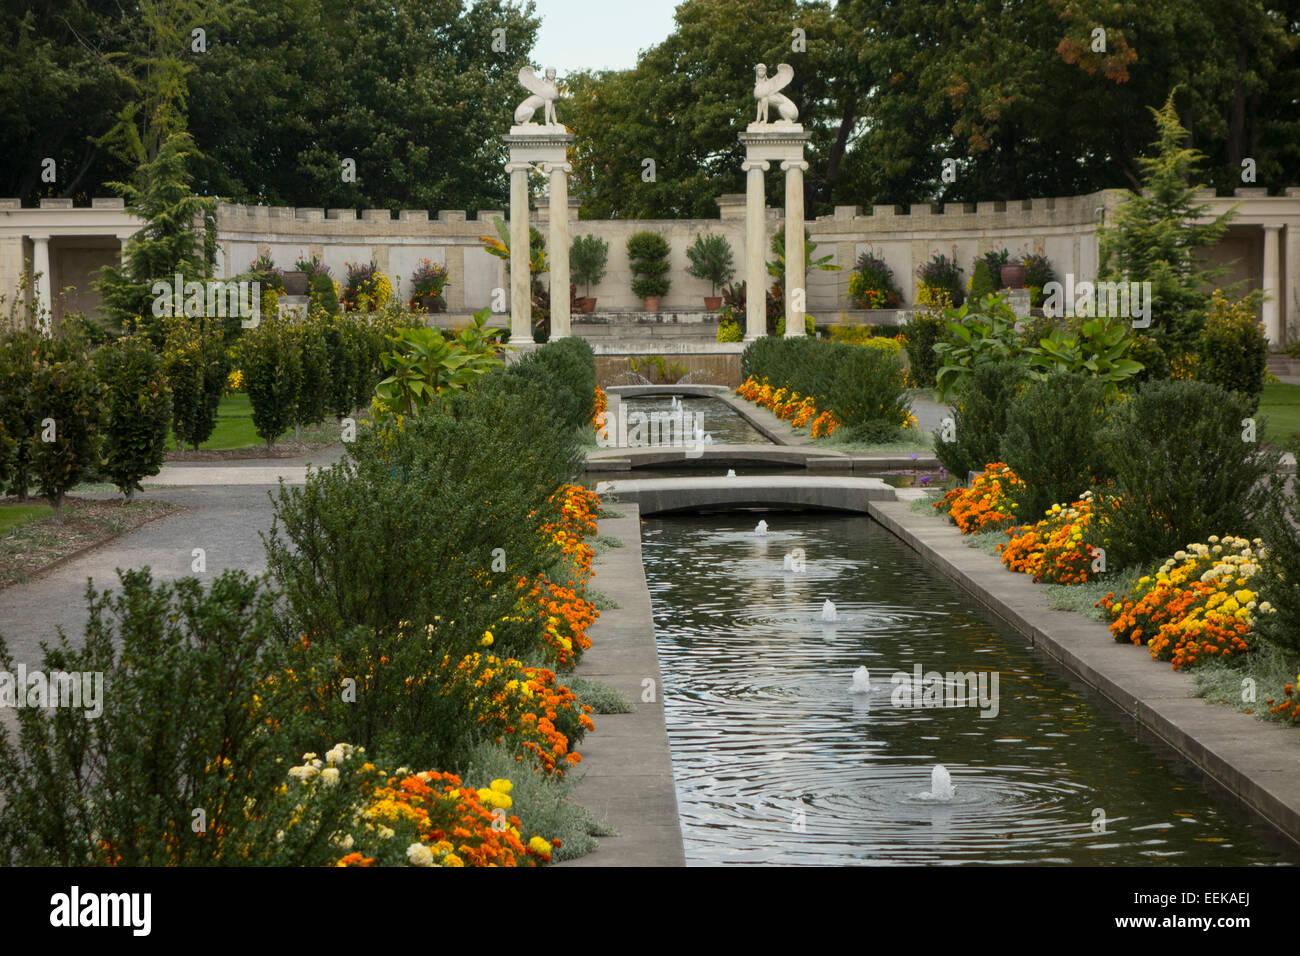 Untermyer Gardens Conservancy In Yonkers Ny Stock Photo 77871994